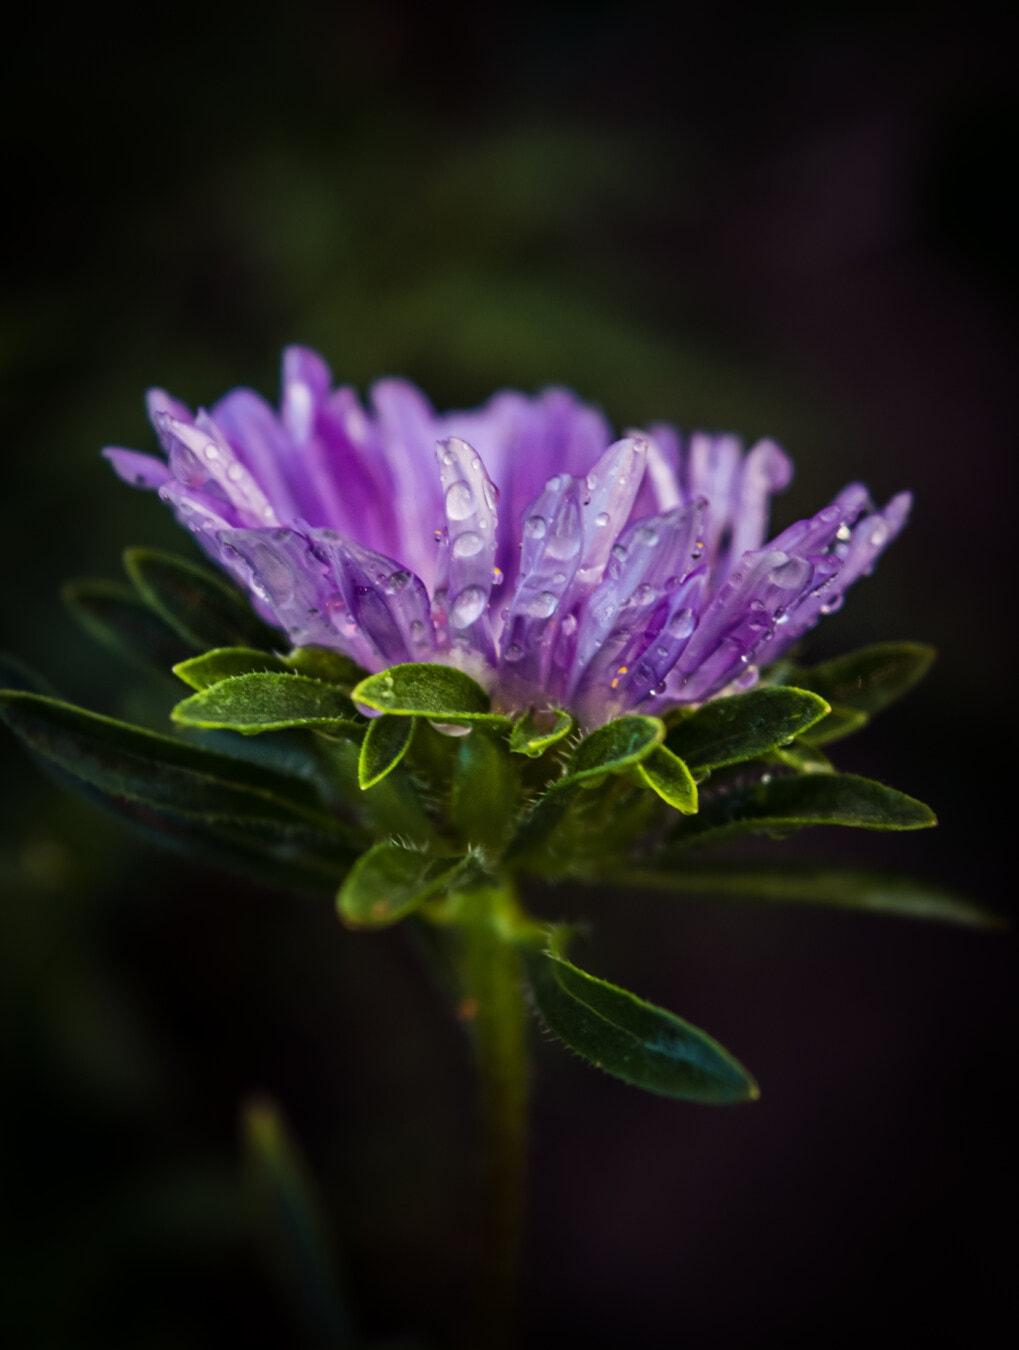 stem, vertical, wildflower, dew, liquid, raindrop, moisture, purplish, macro, close-up